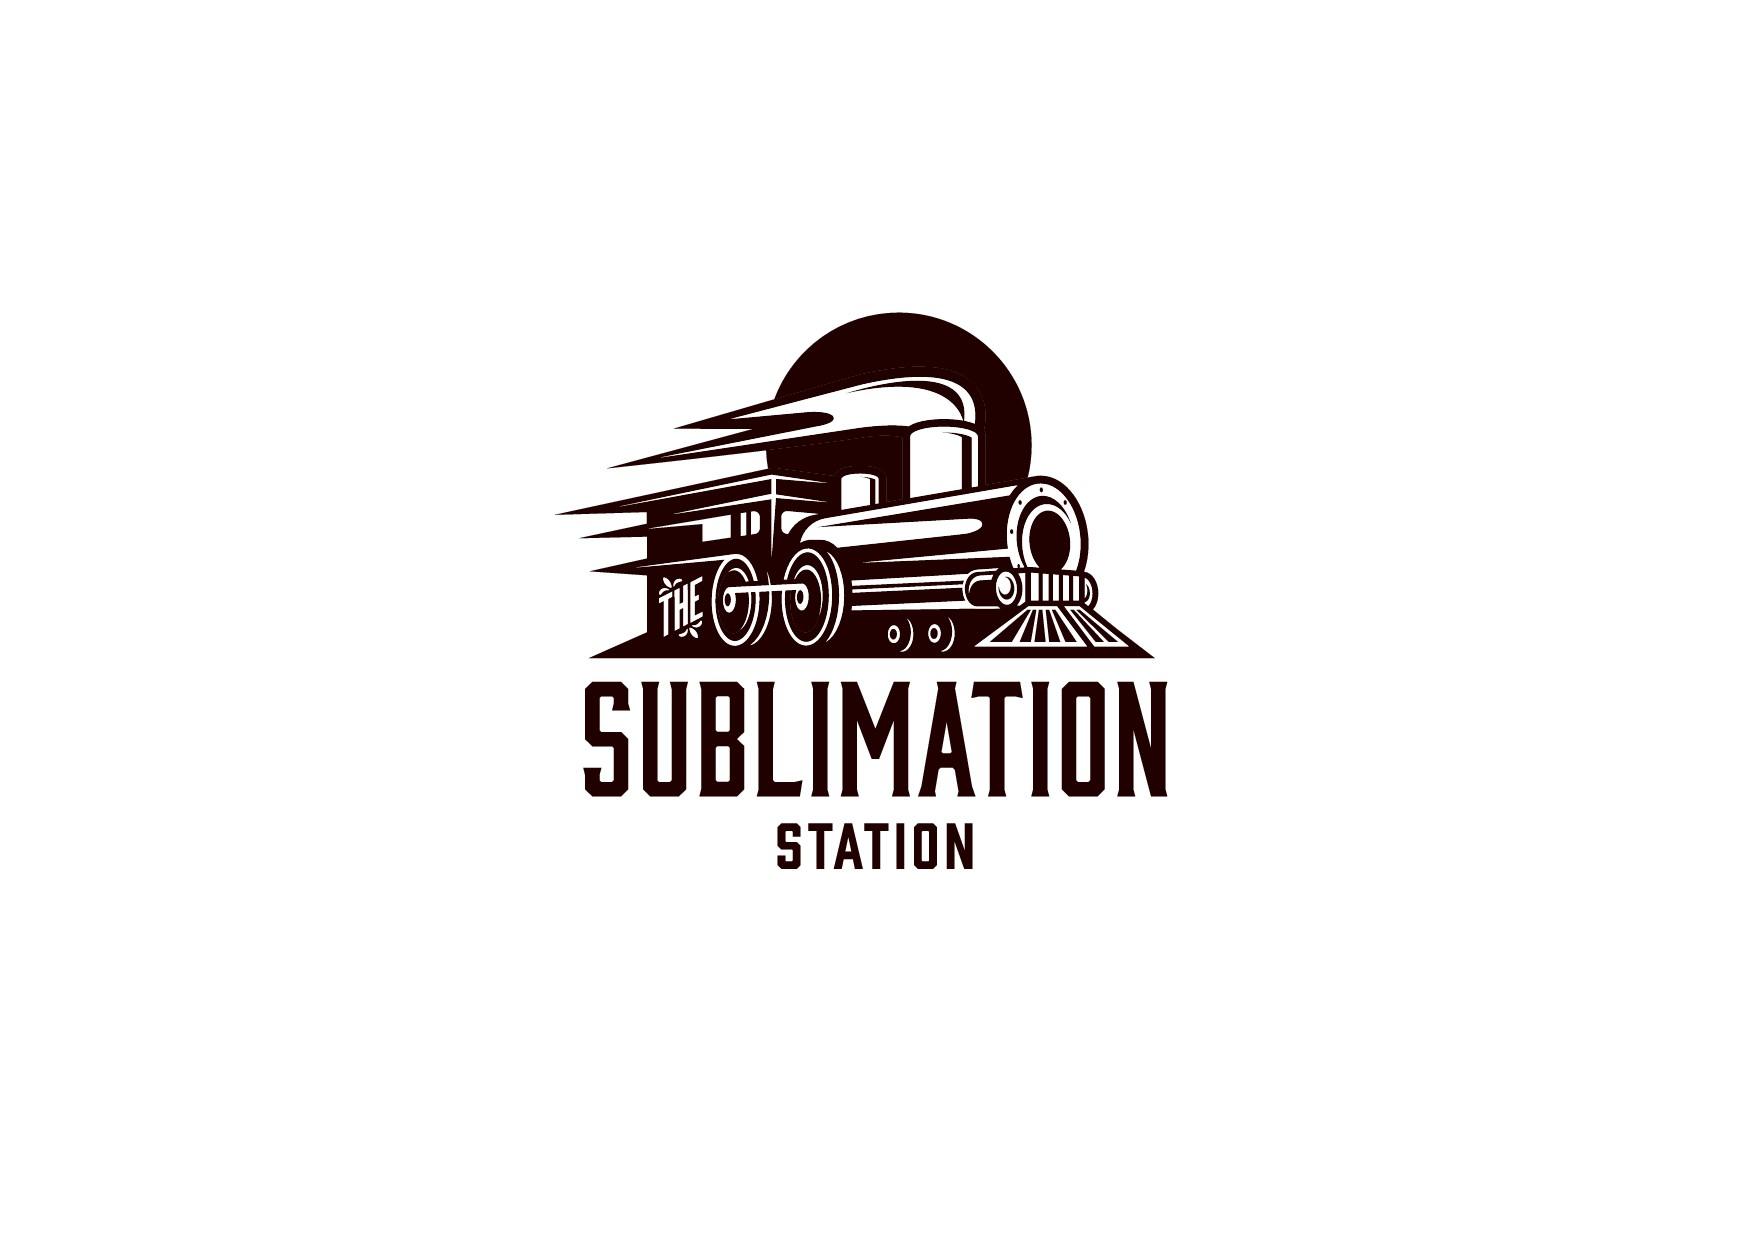 Sublimation Station